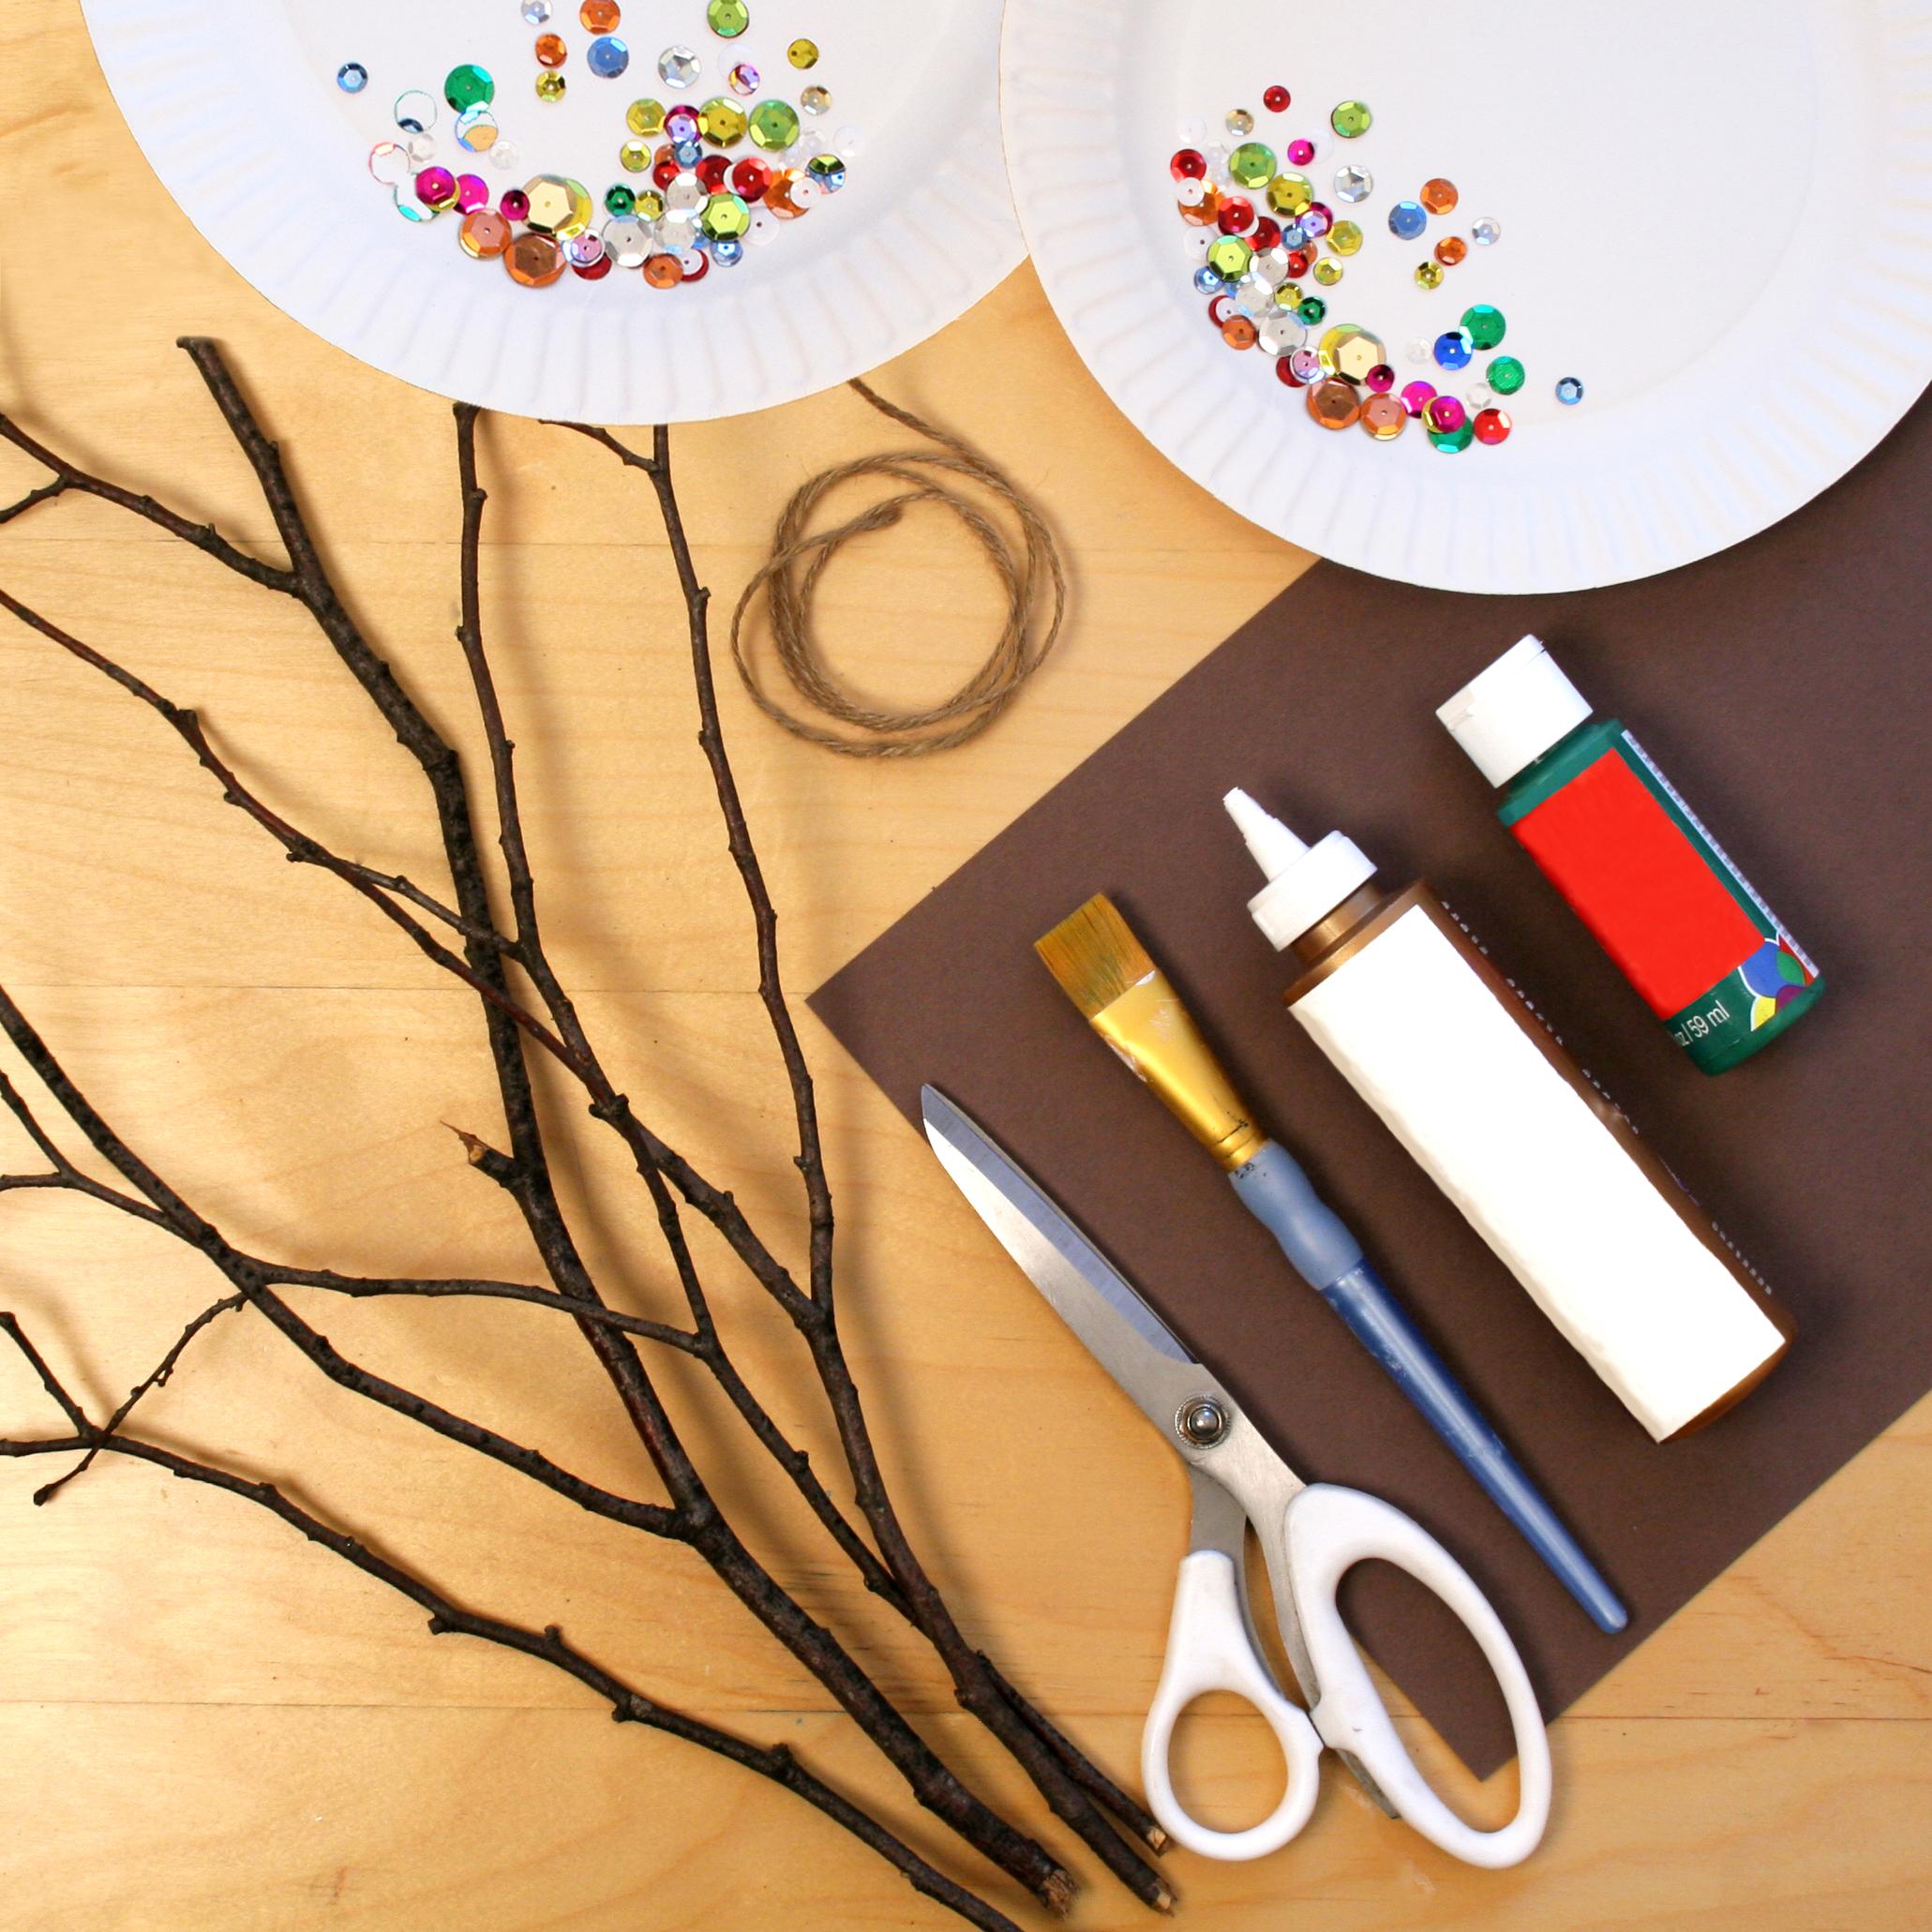 Christmas tree ornament craft materials